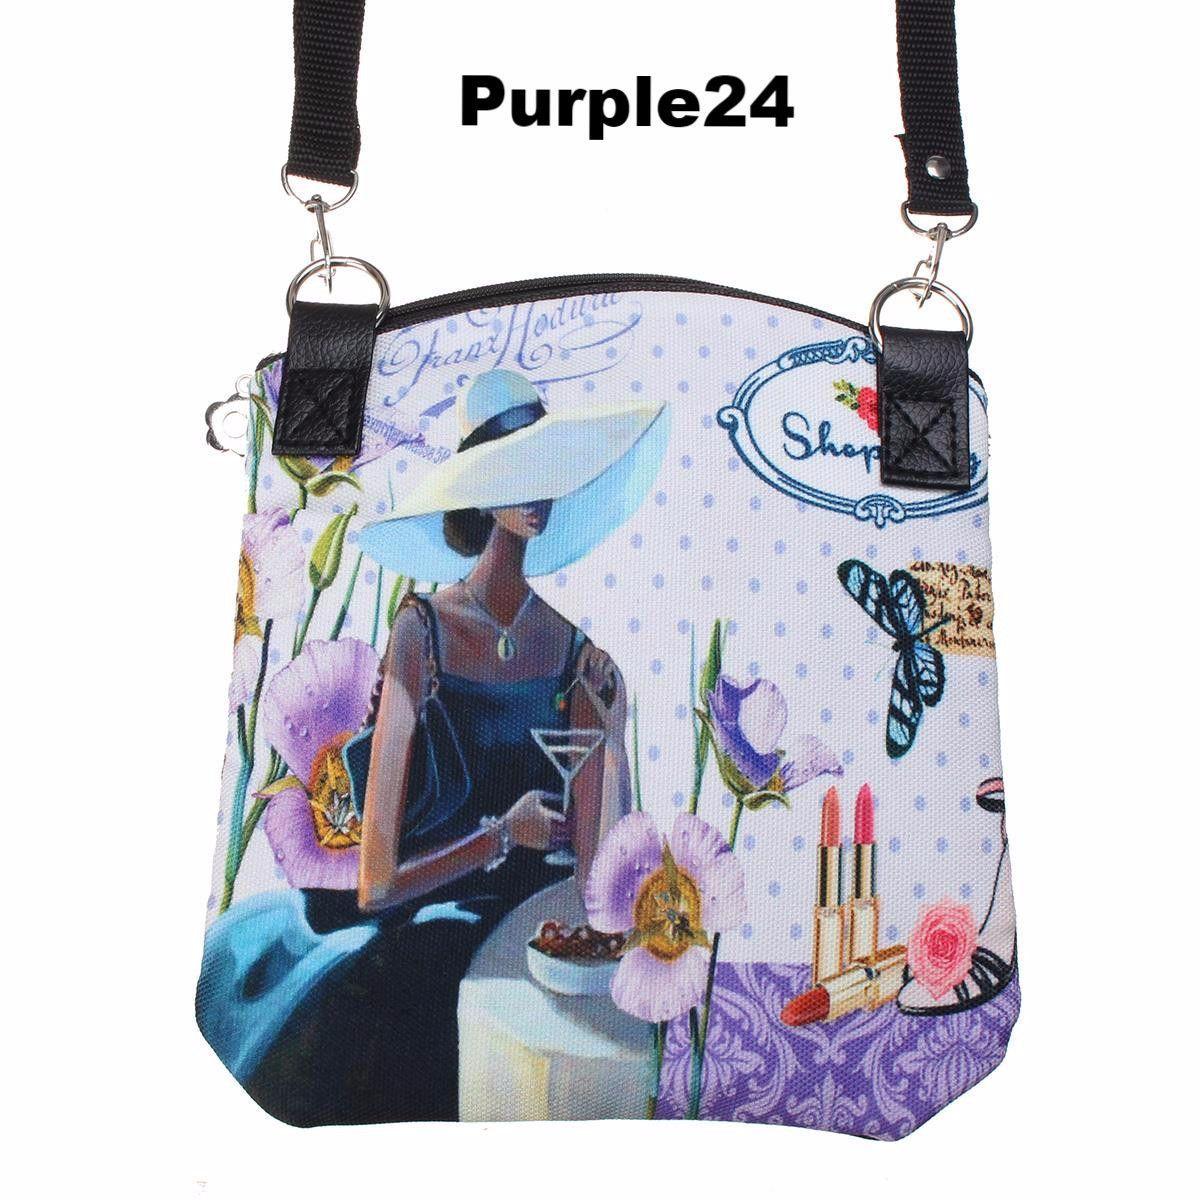 52d83cdcb0d4 New Women Messenger Bags Vintage Canvas Printing Small Satchel Shoulder  European Style Girls Handbag Lady Bolsa Crossbody Bag